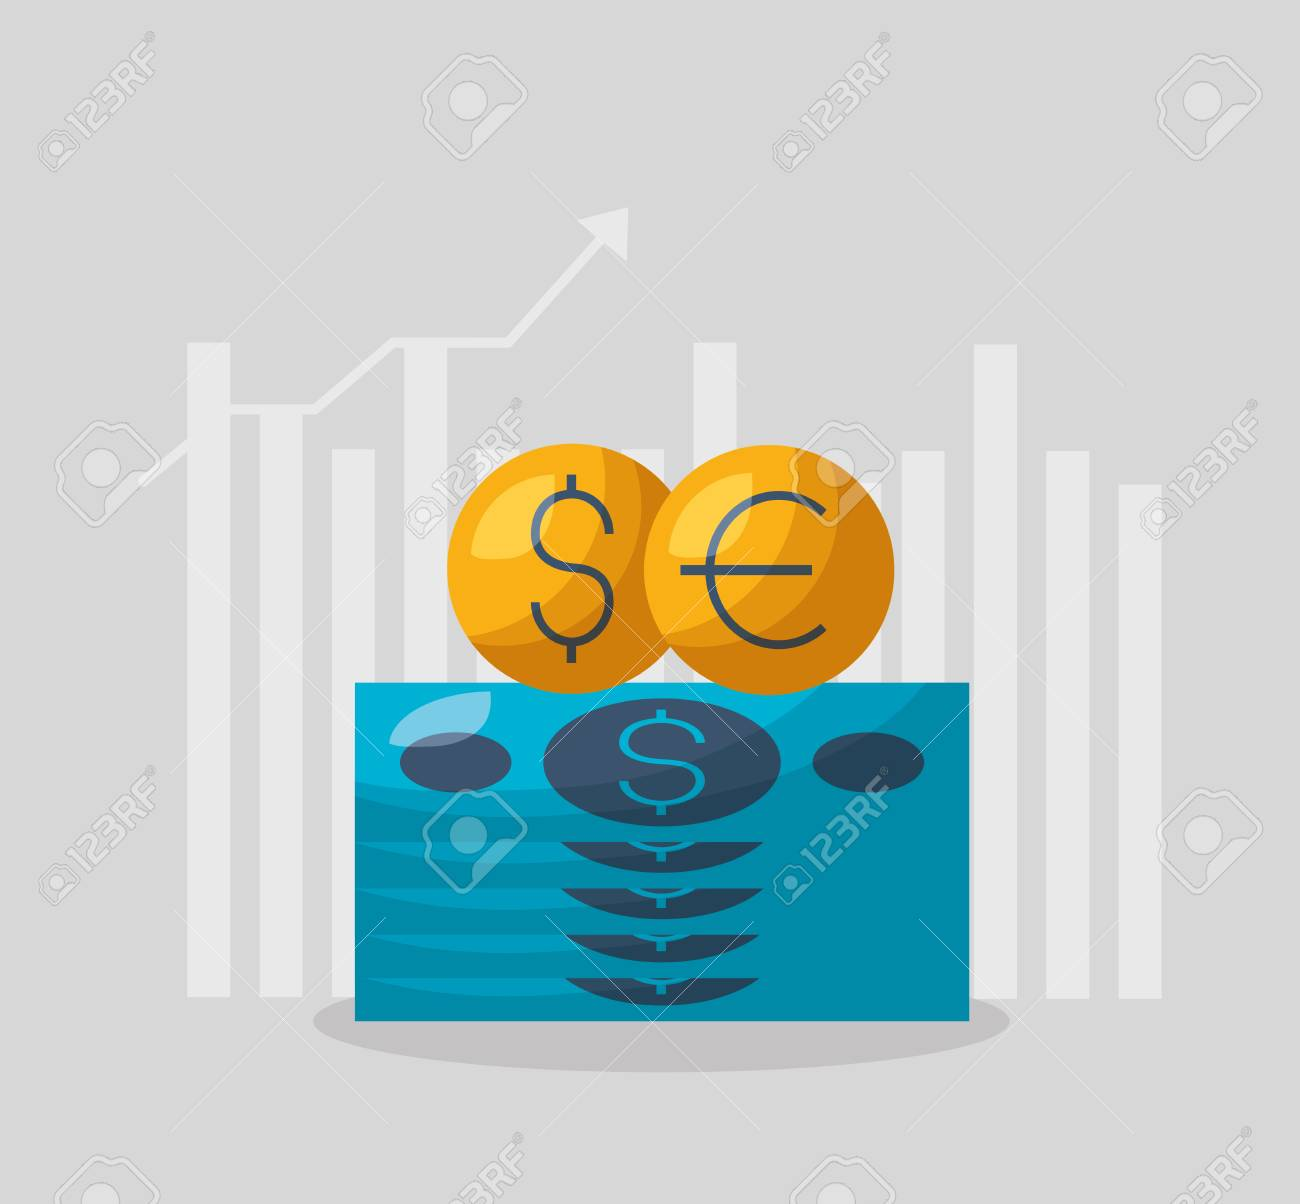 money dollar euro chart financial stock market vector illustration - 119178210